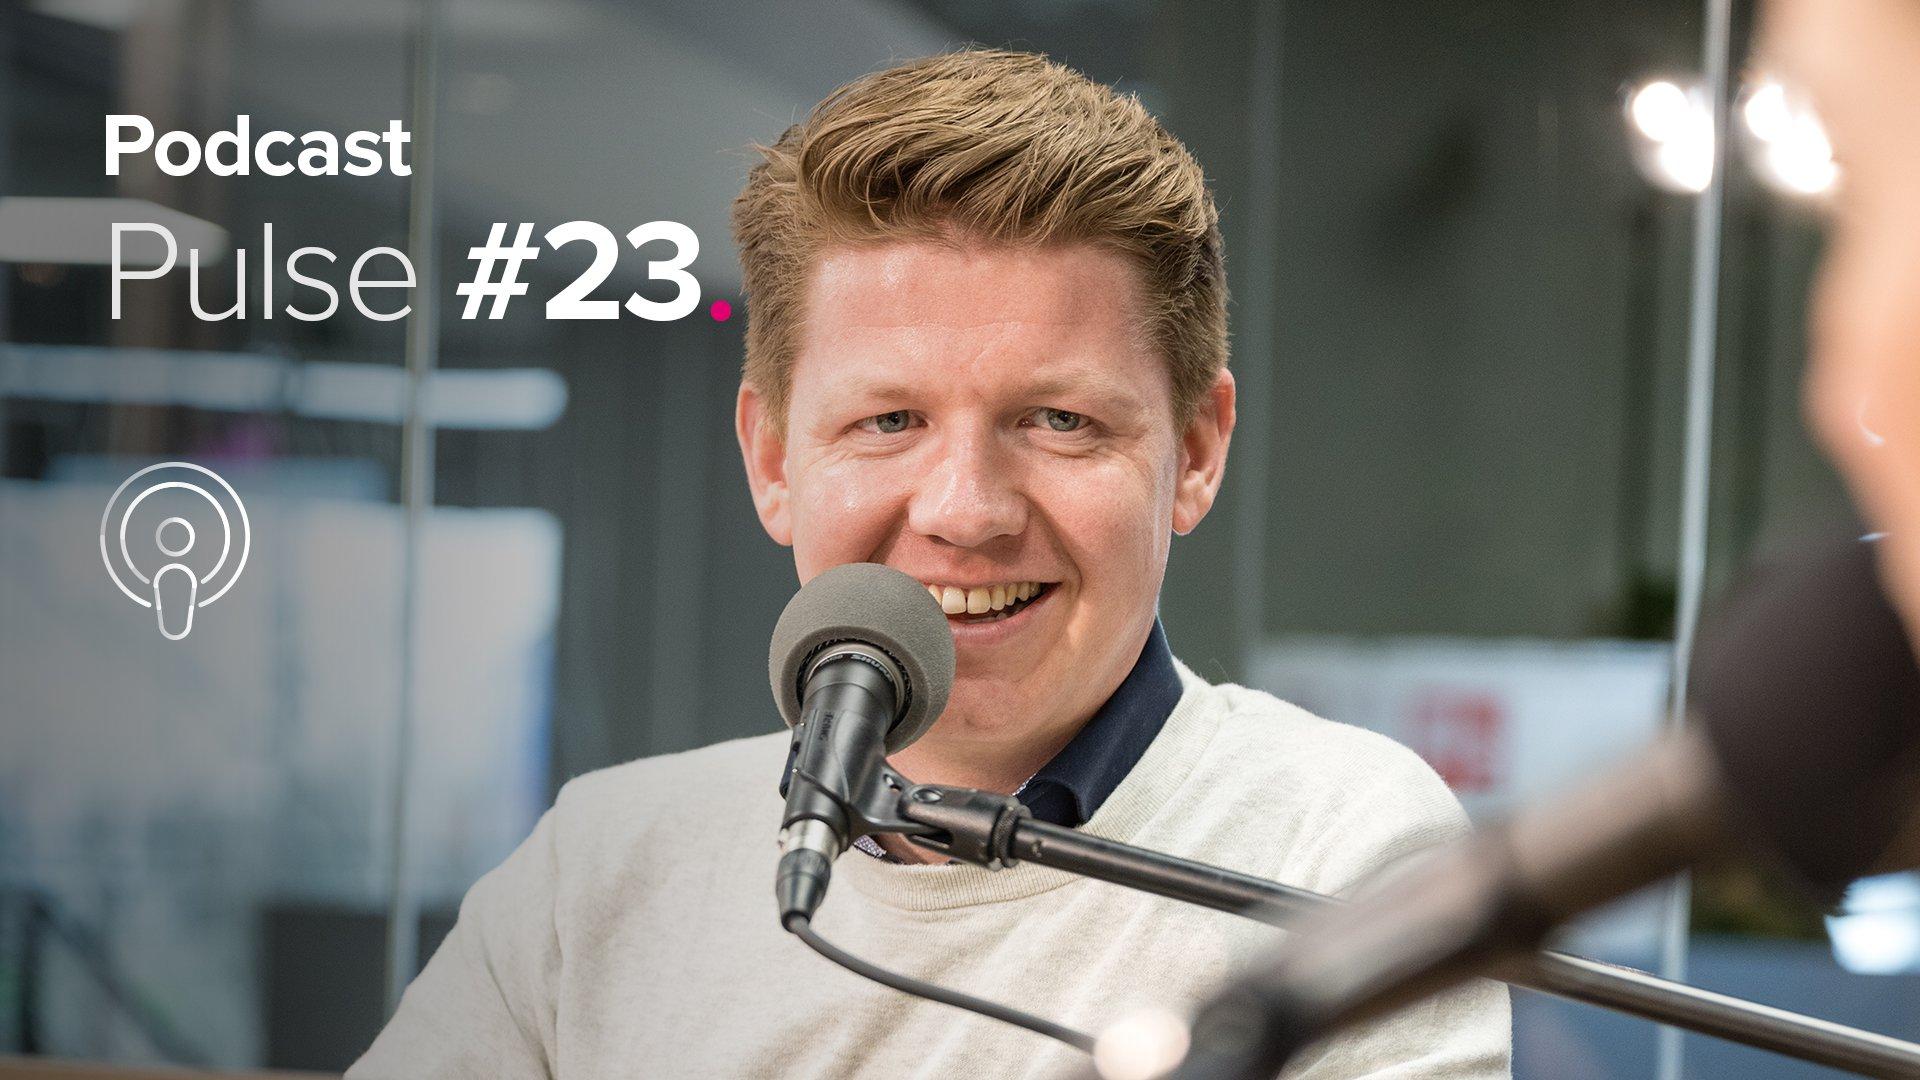 Podcast Digital Brains Pulse #23